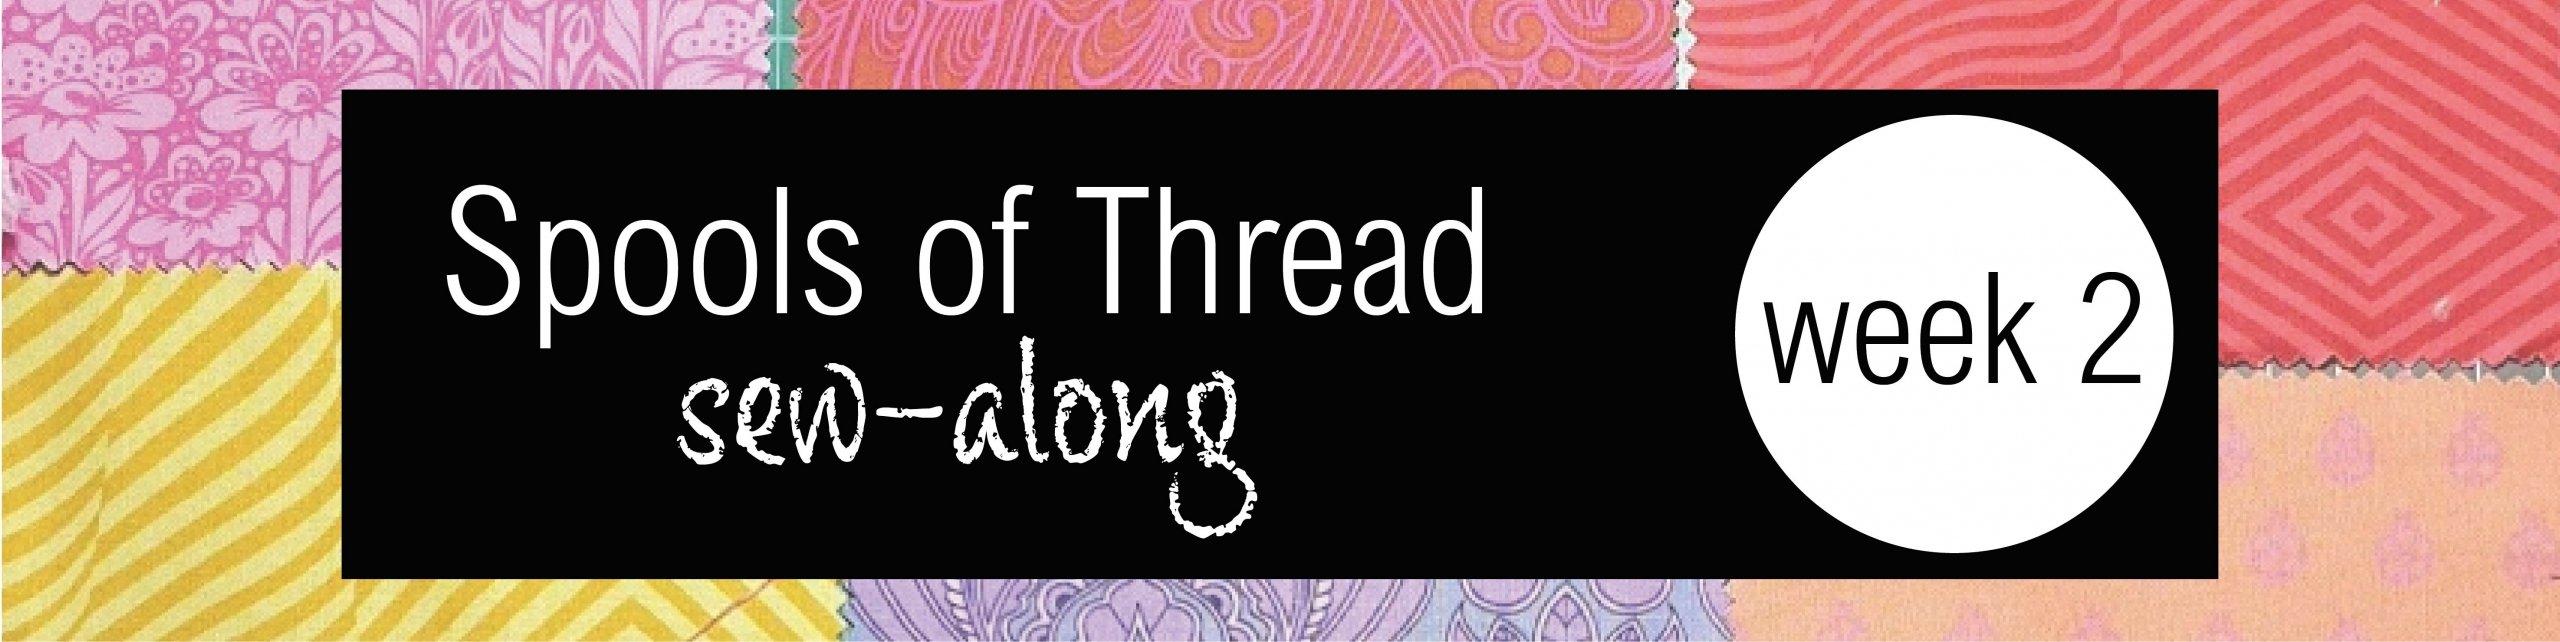 Spools of Thread sew along week 2